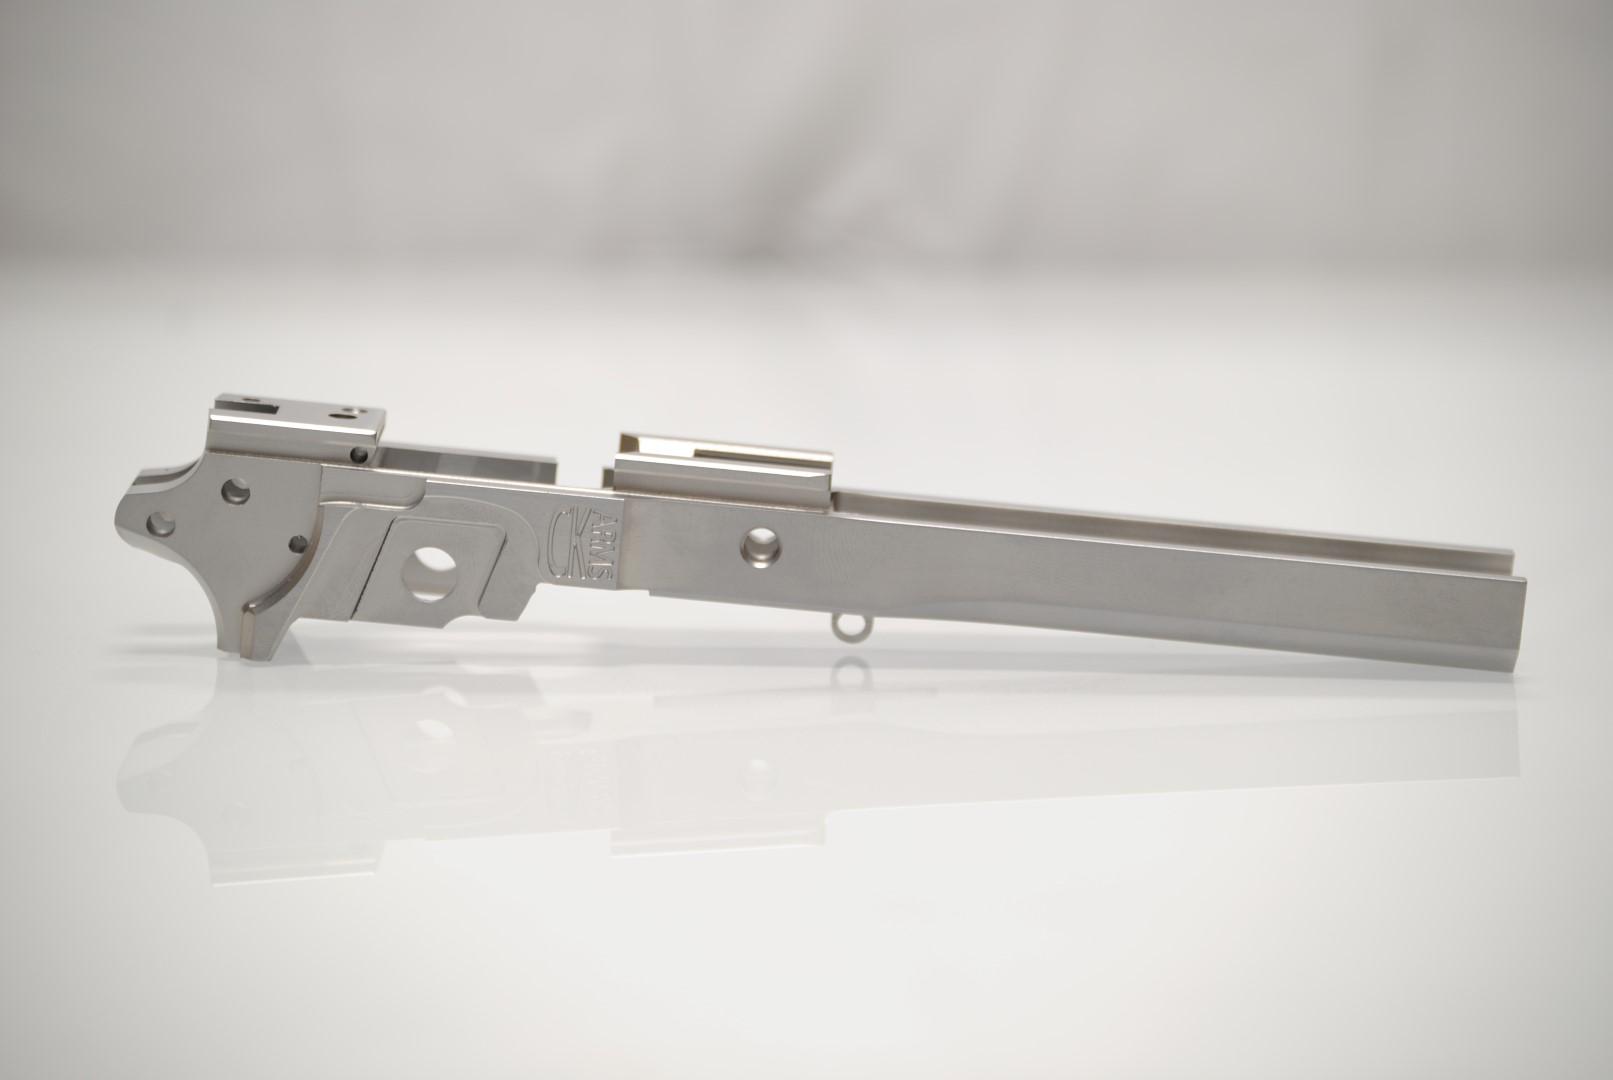 Ck Arms Frame Widebody Ldc